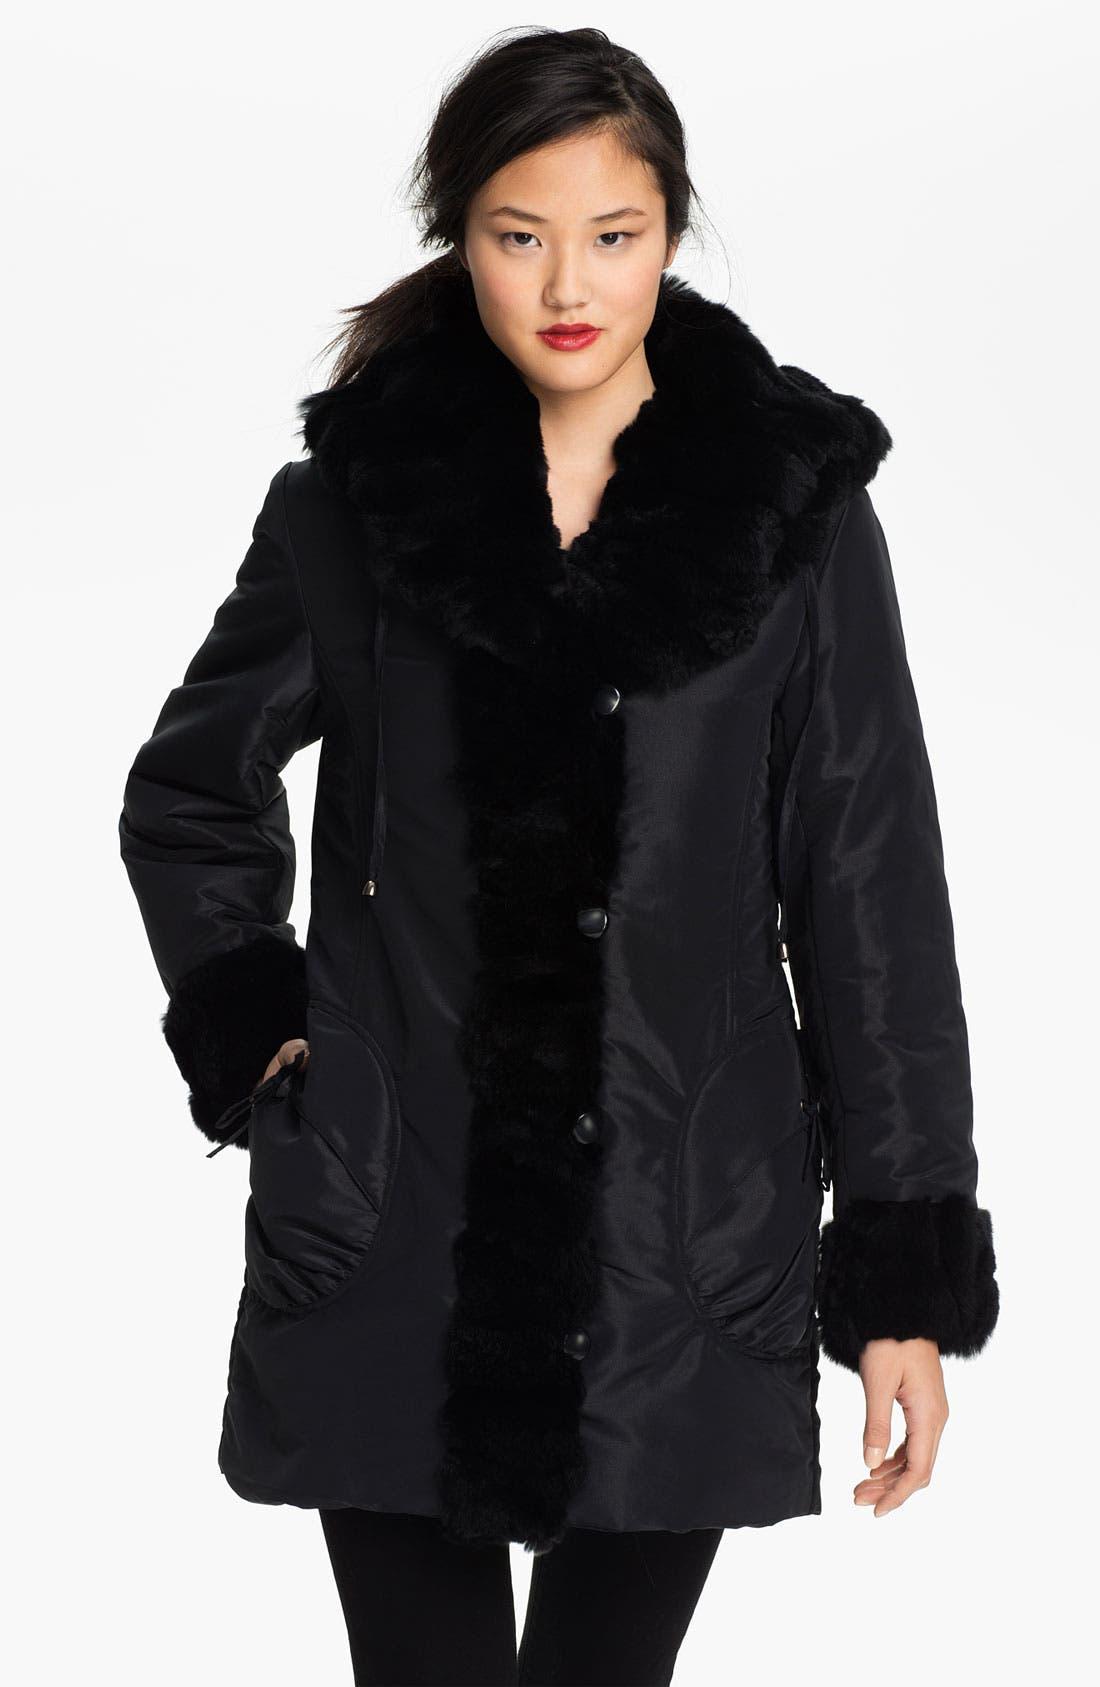 Main Image - Jessica Wilde Storm Coat with Genuine Rabbit Fur